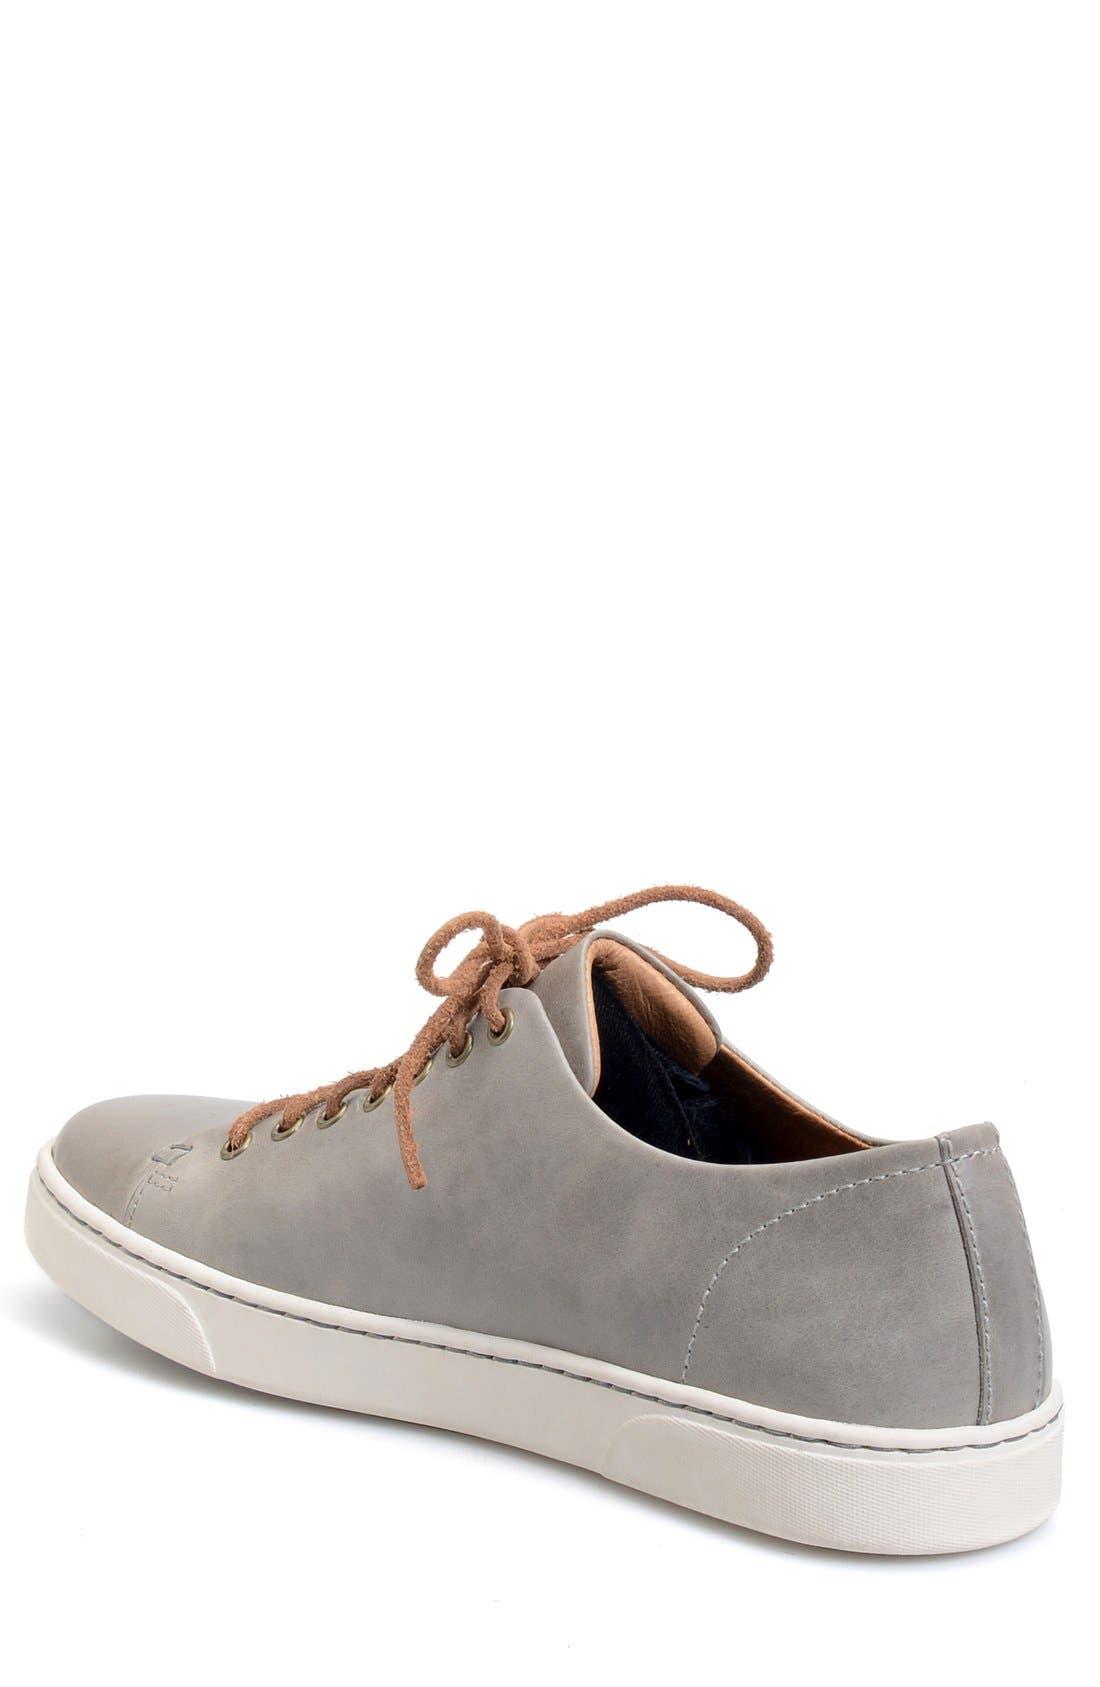 'Bayne' Cap Toe Sneaker,                             Alternate thumbnail 11, color,